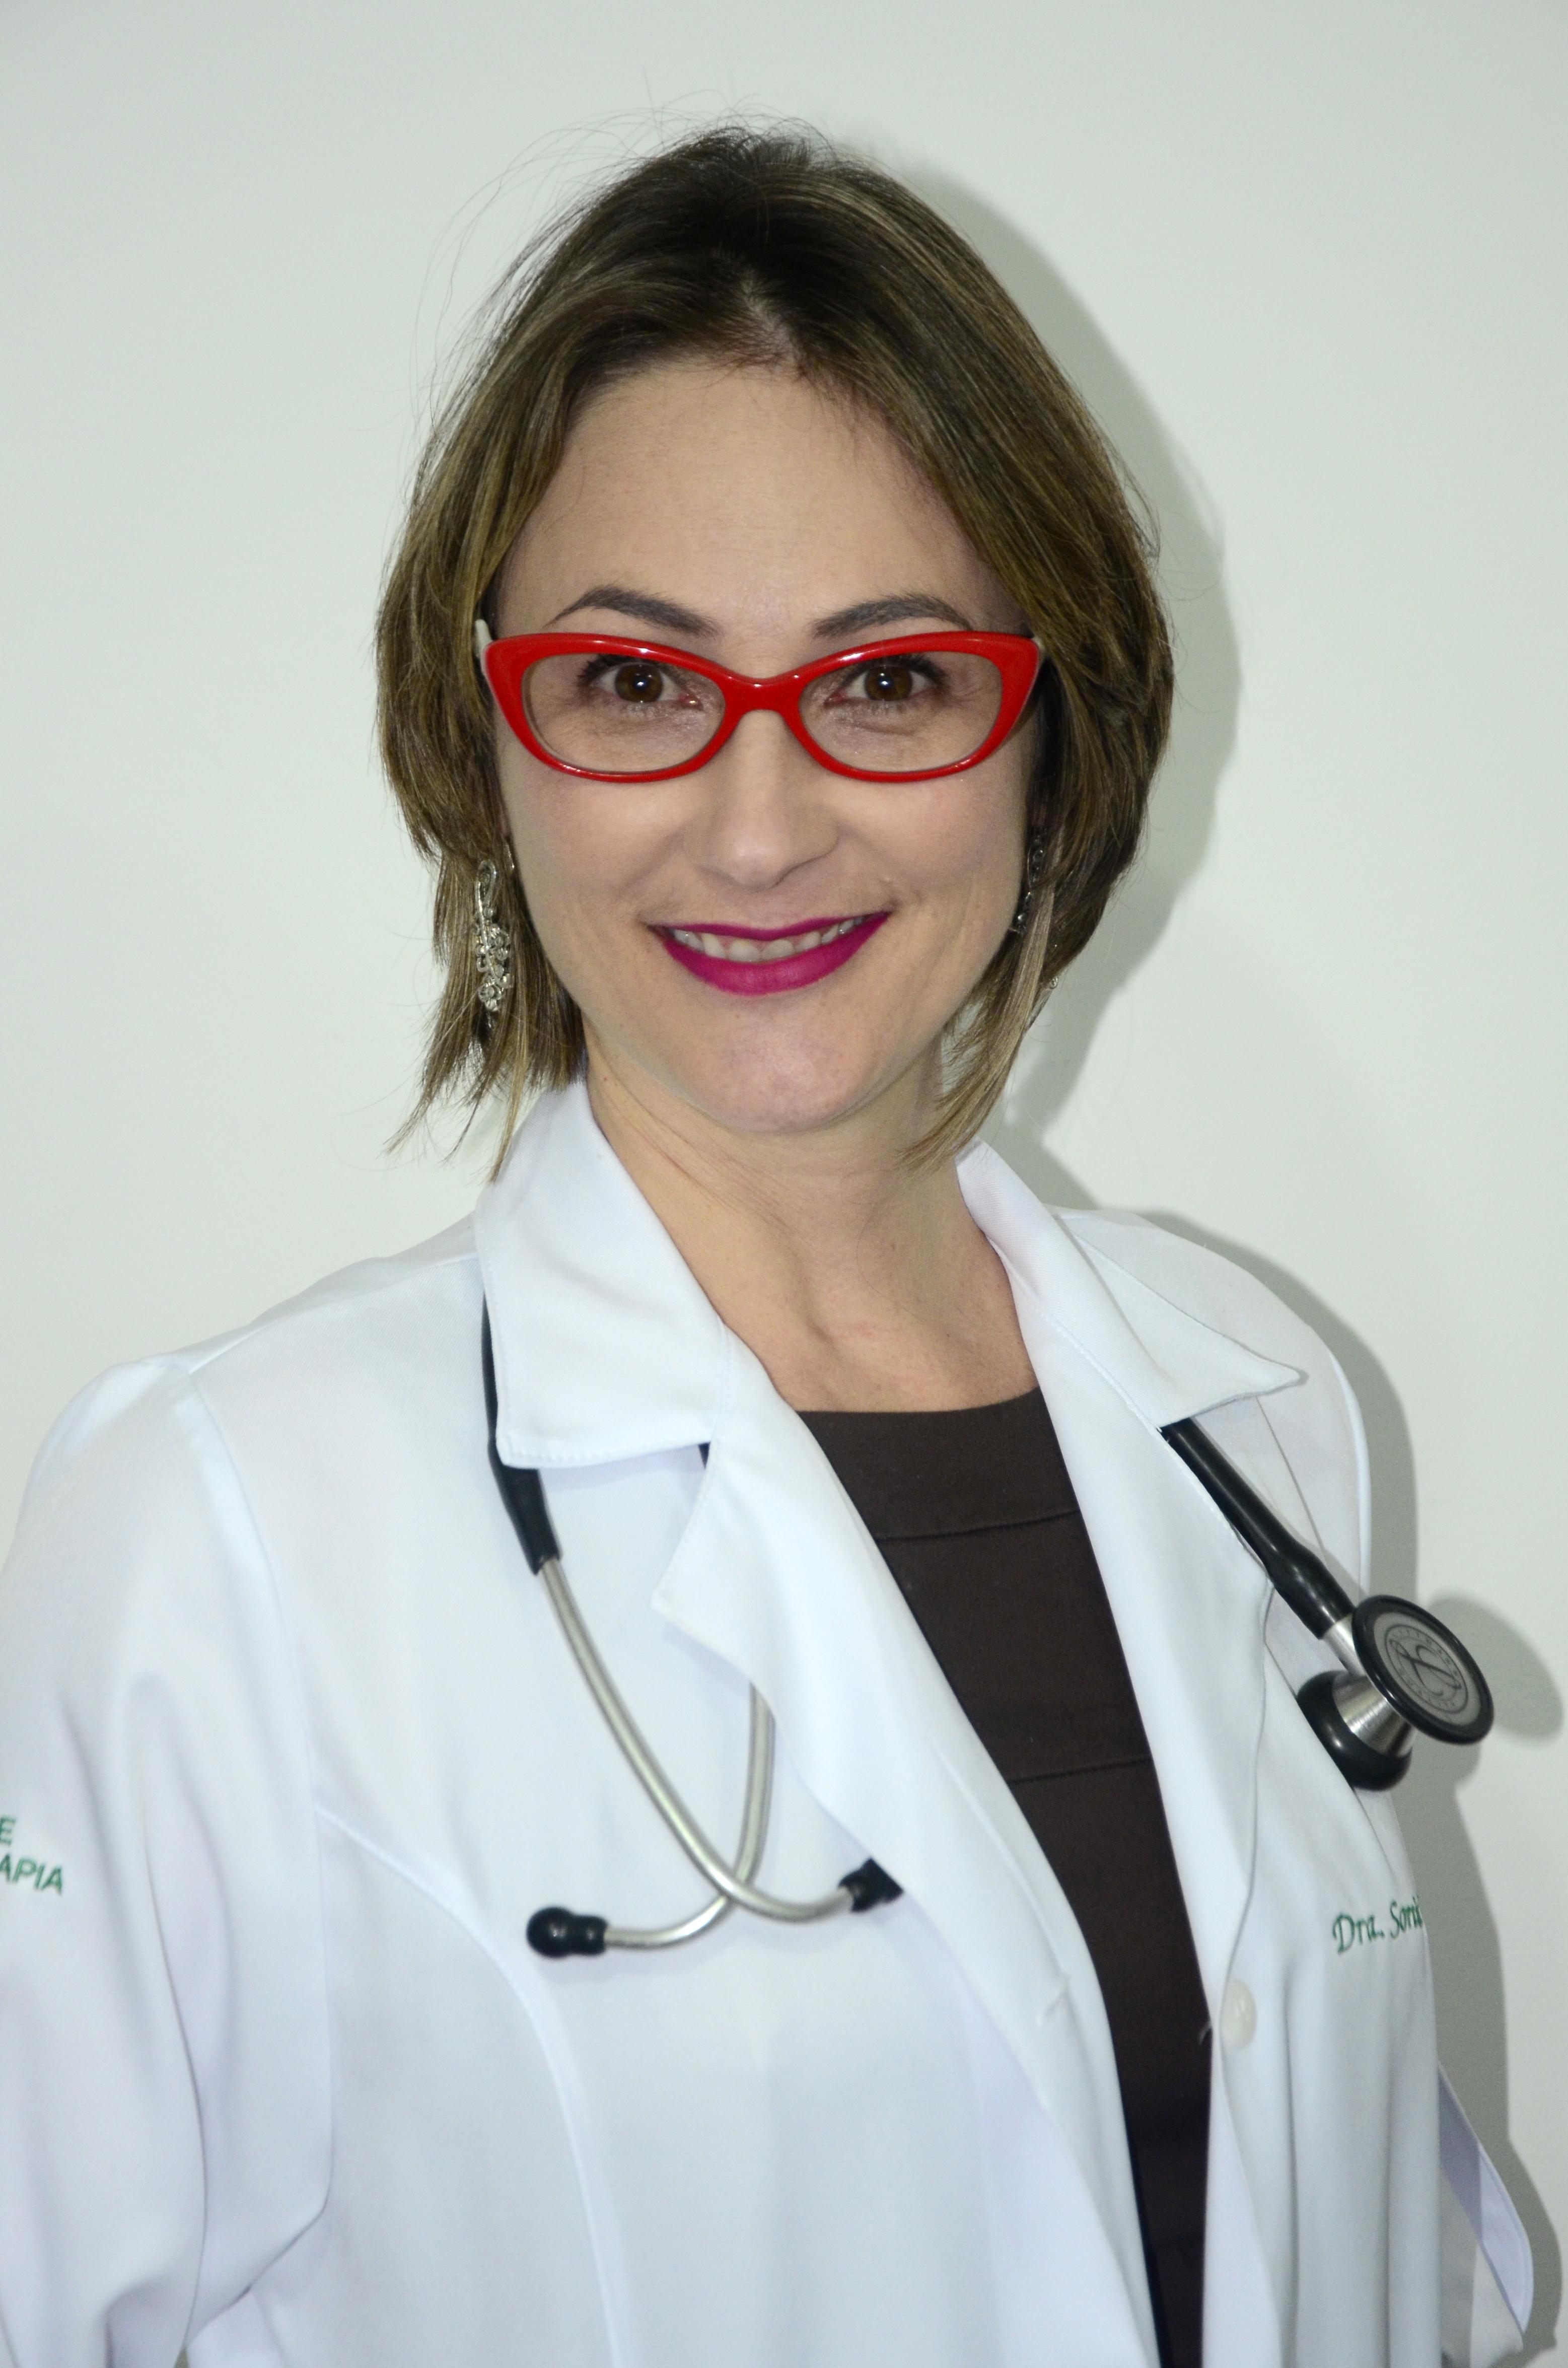 Sonia Cristina de Magalhães Souza Fialho